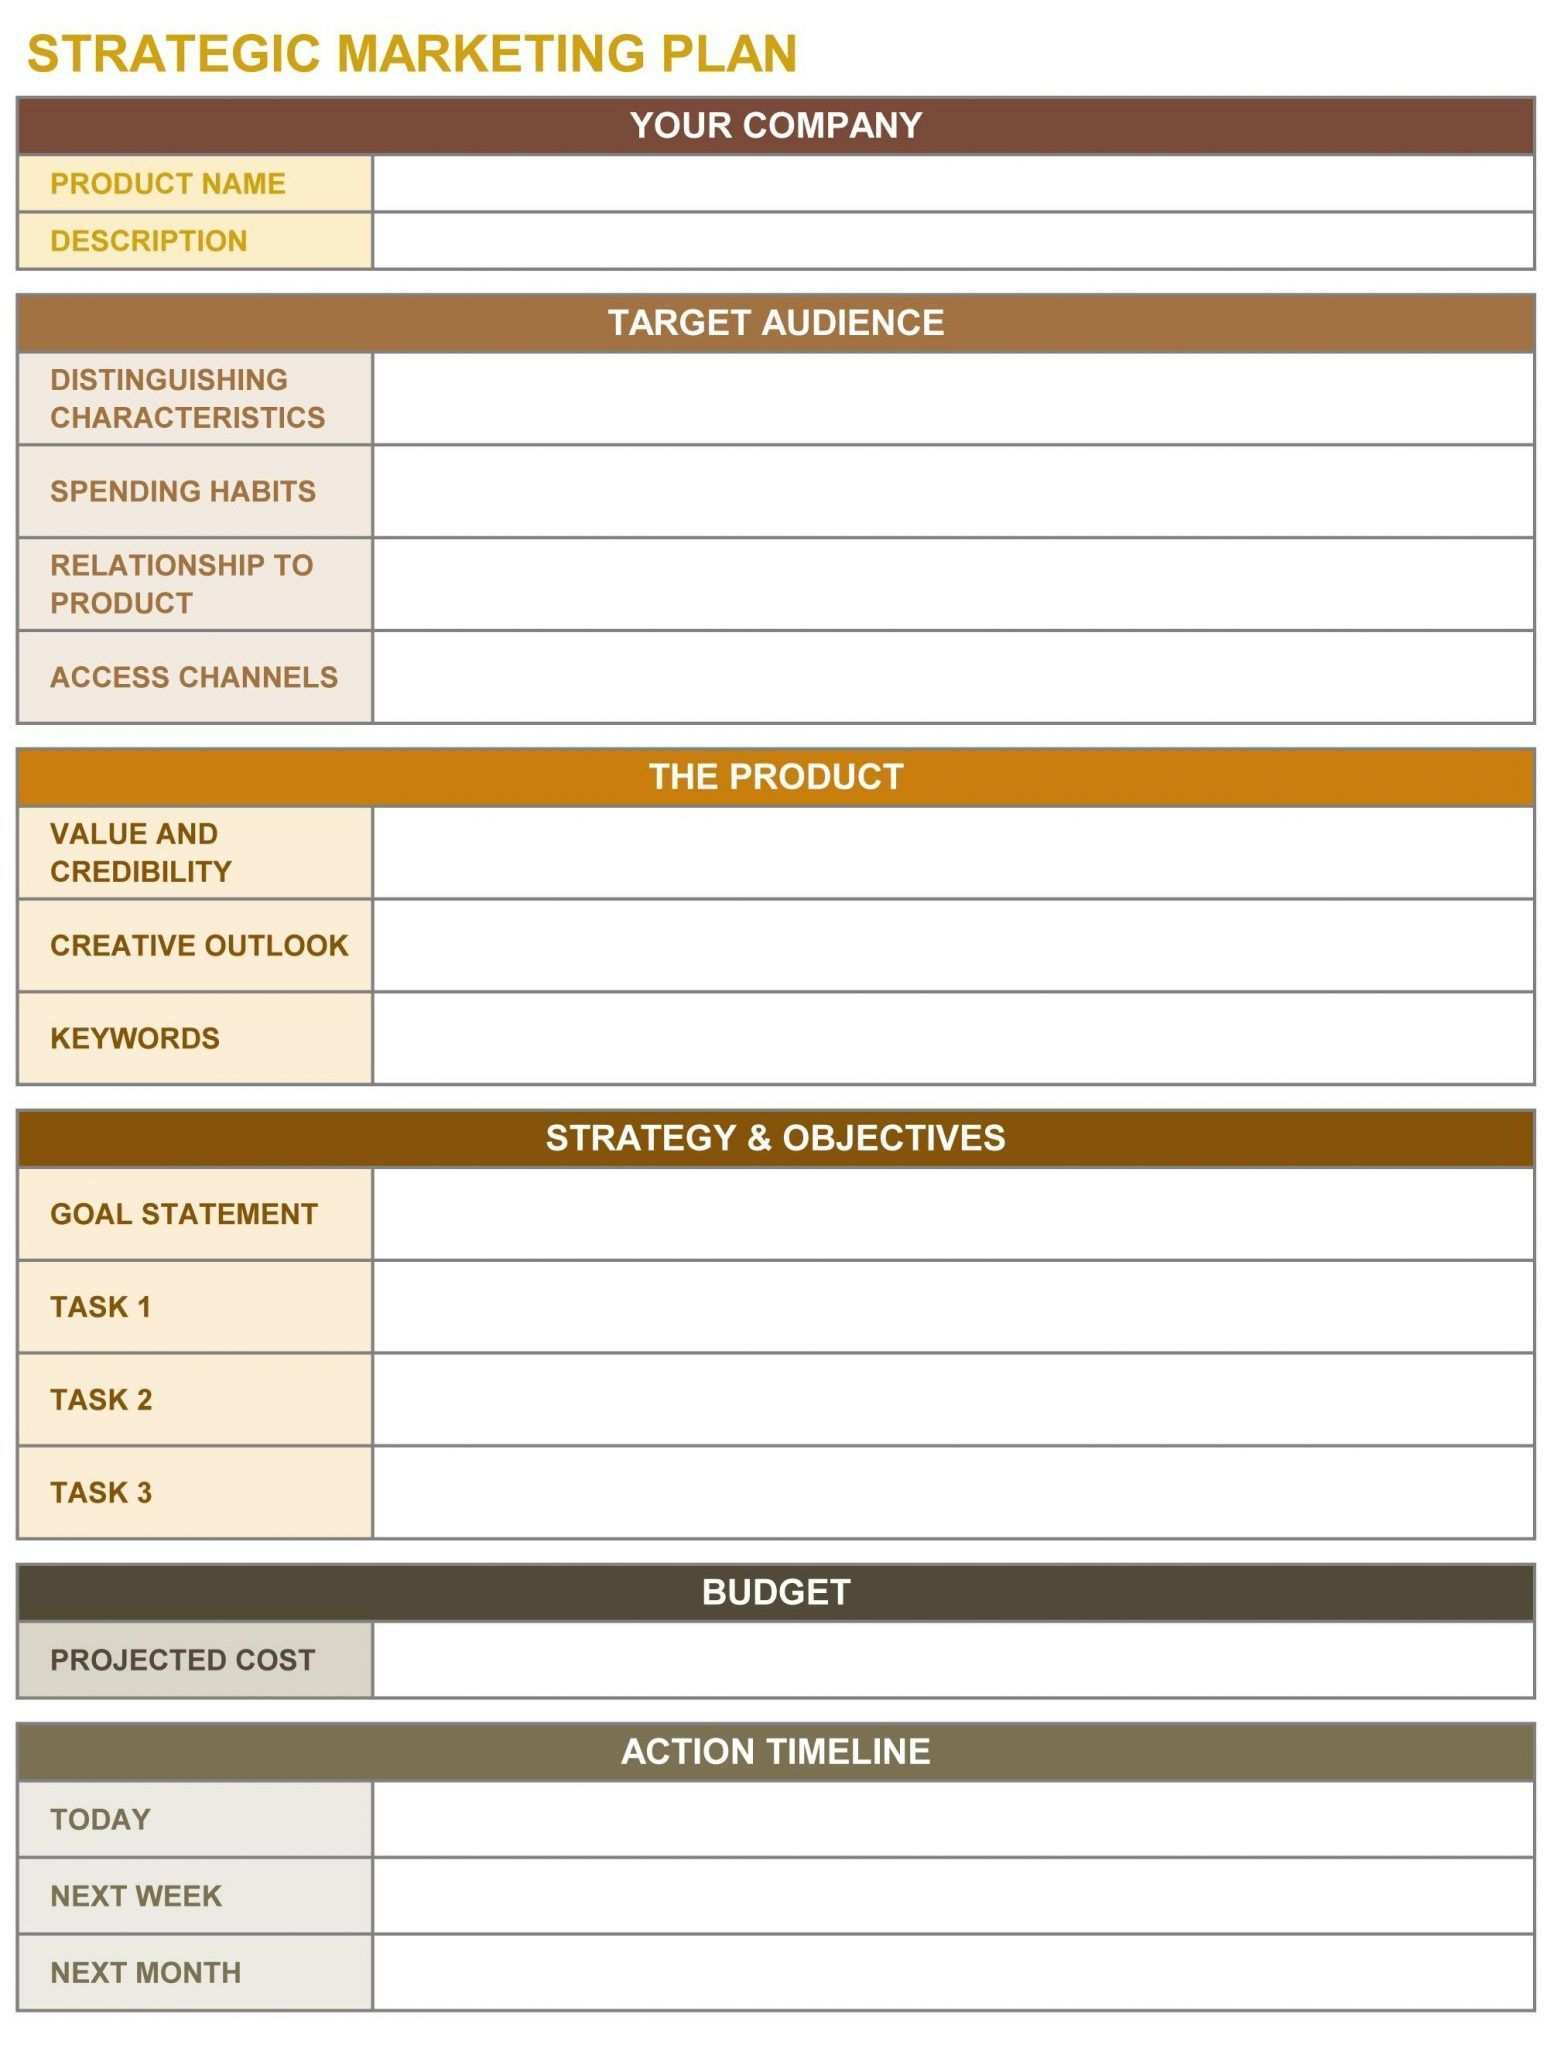 Strategic Marketing Plan Template Strategic Planning Template Strategic Marketing Plan Marketing Strategy Template